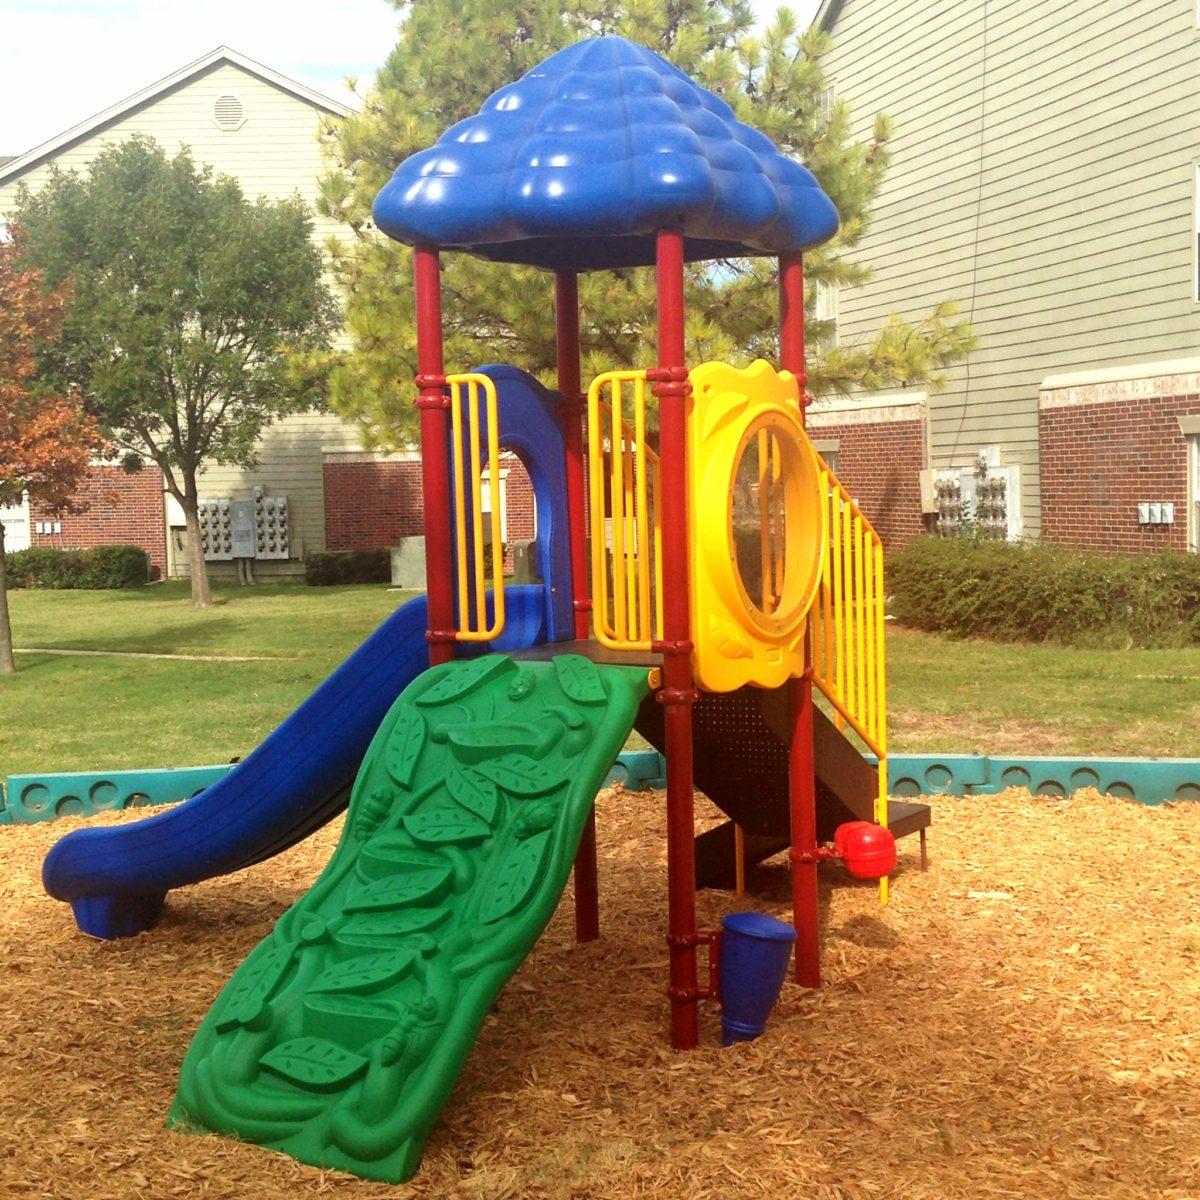 Garden-Courtyards-Tulsa-Oklahoma-Playground